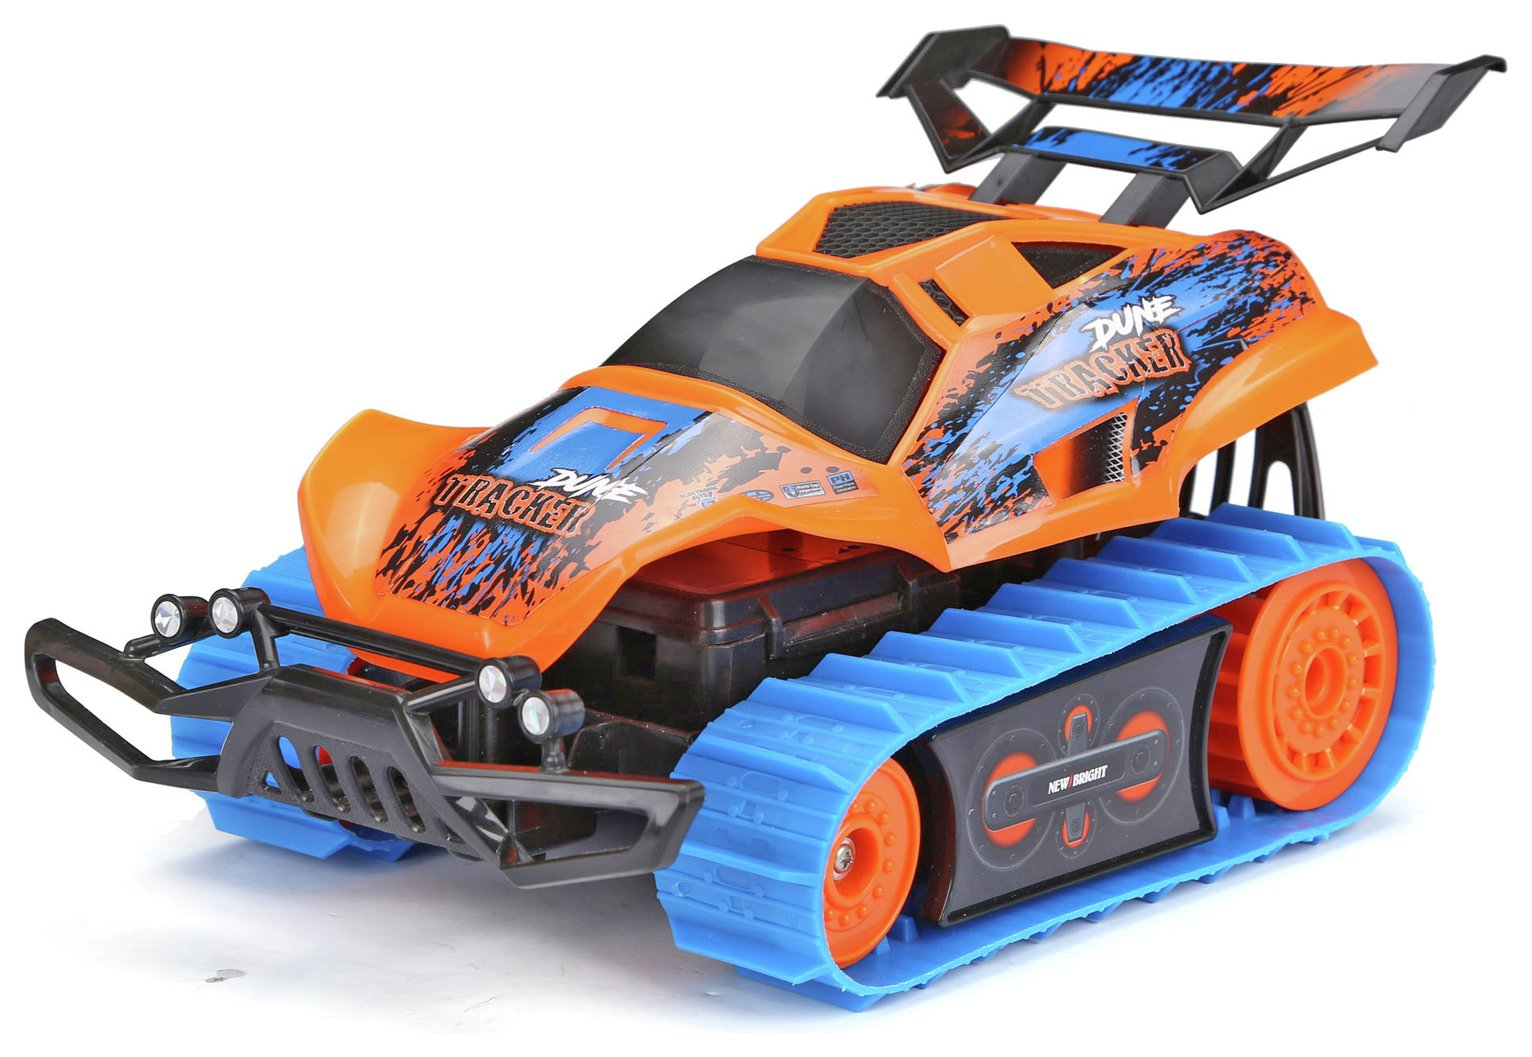 Dune Tracker 1:18 Radio Controlled Car